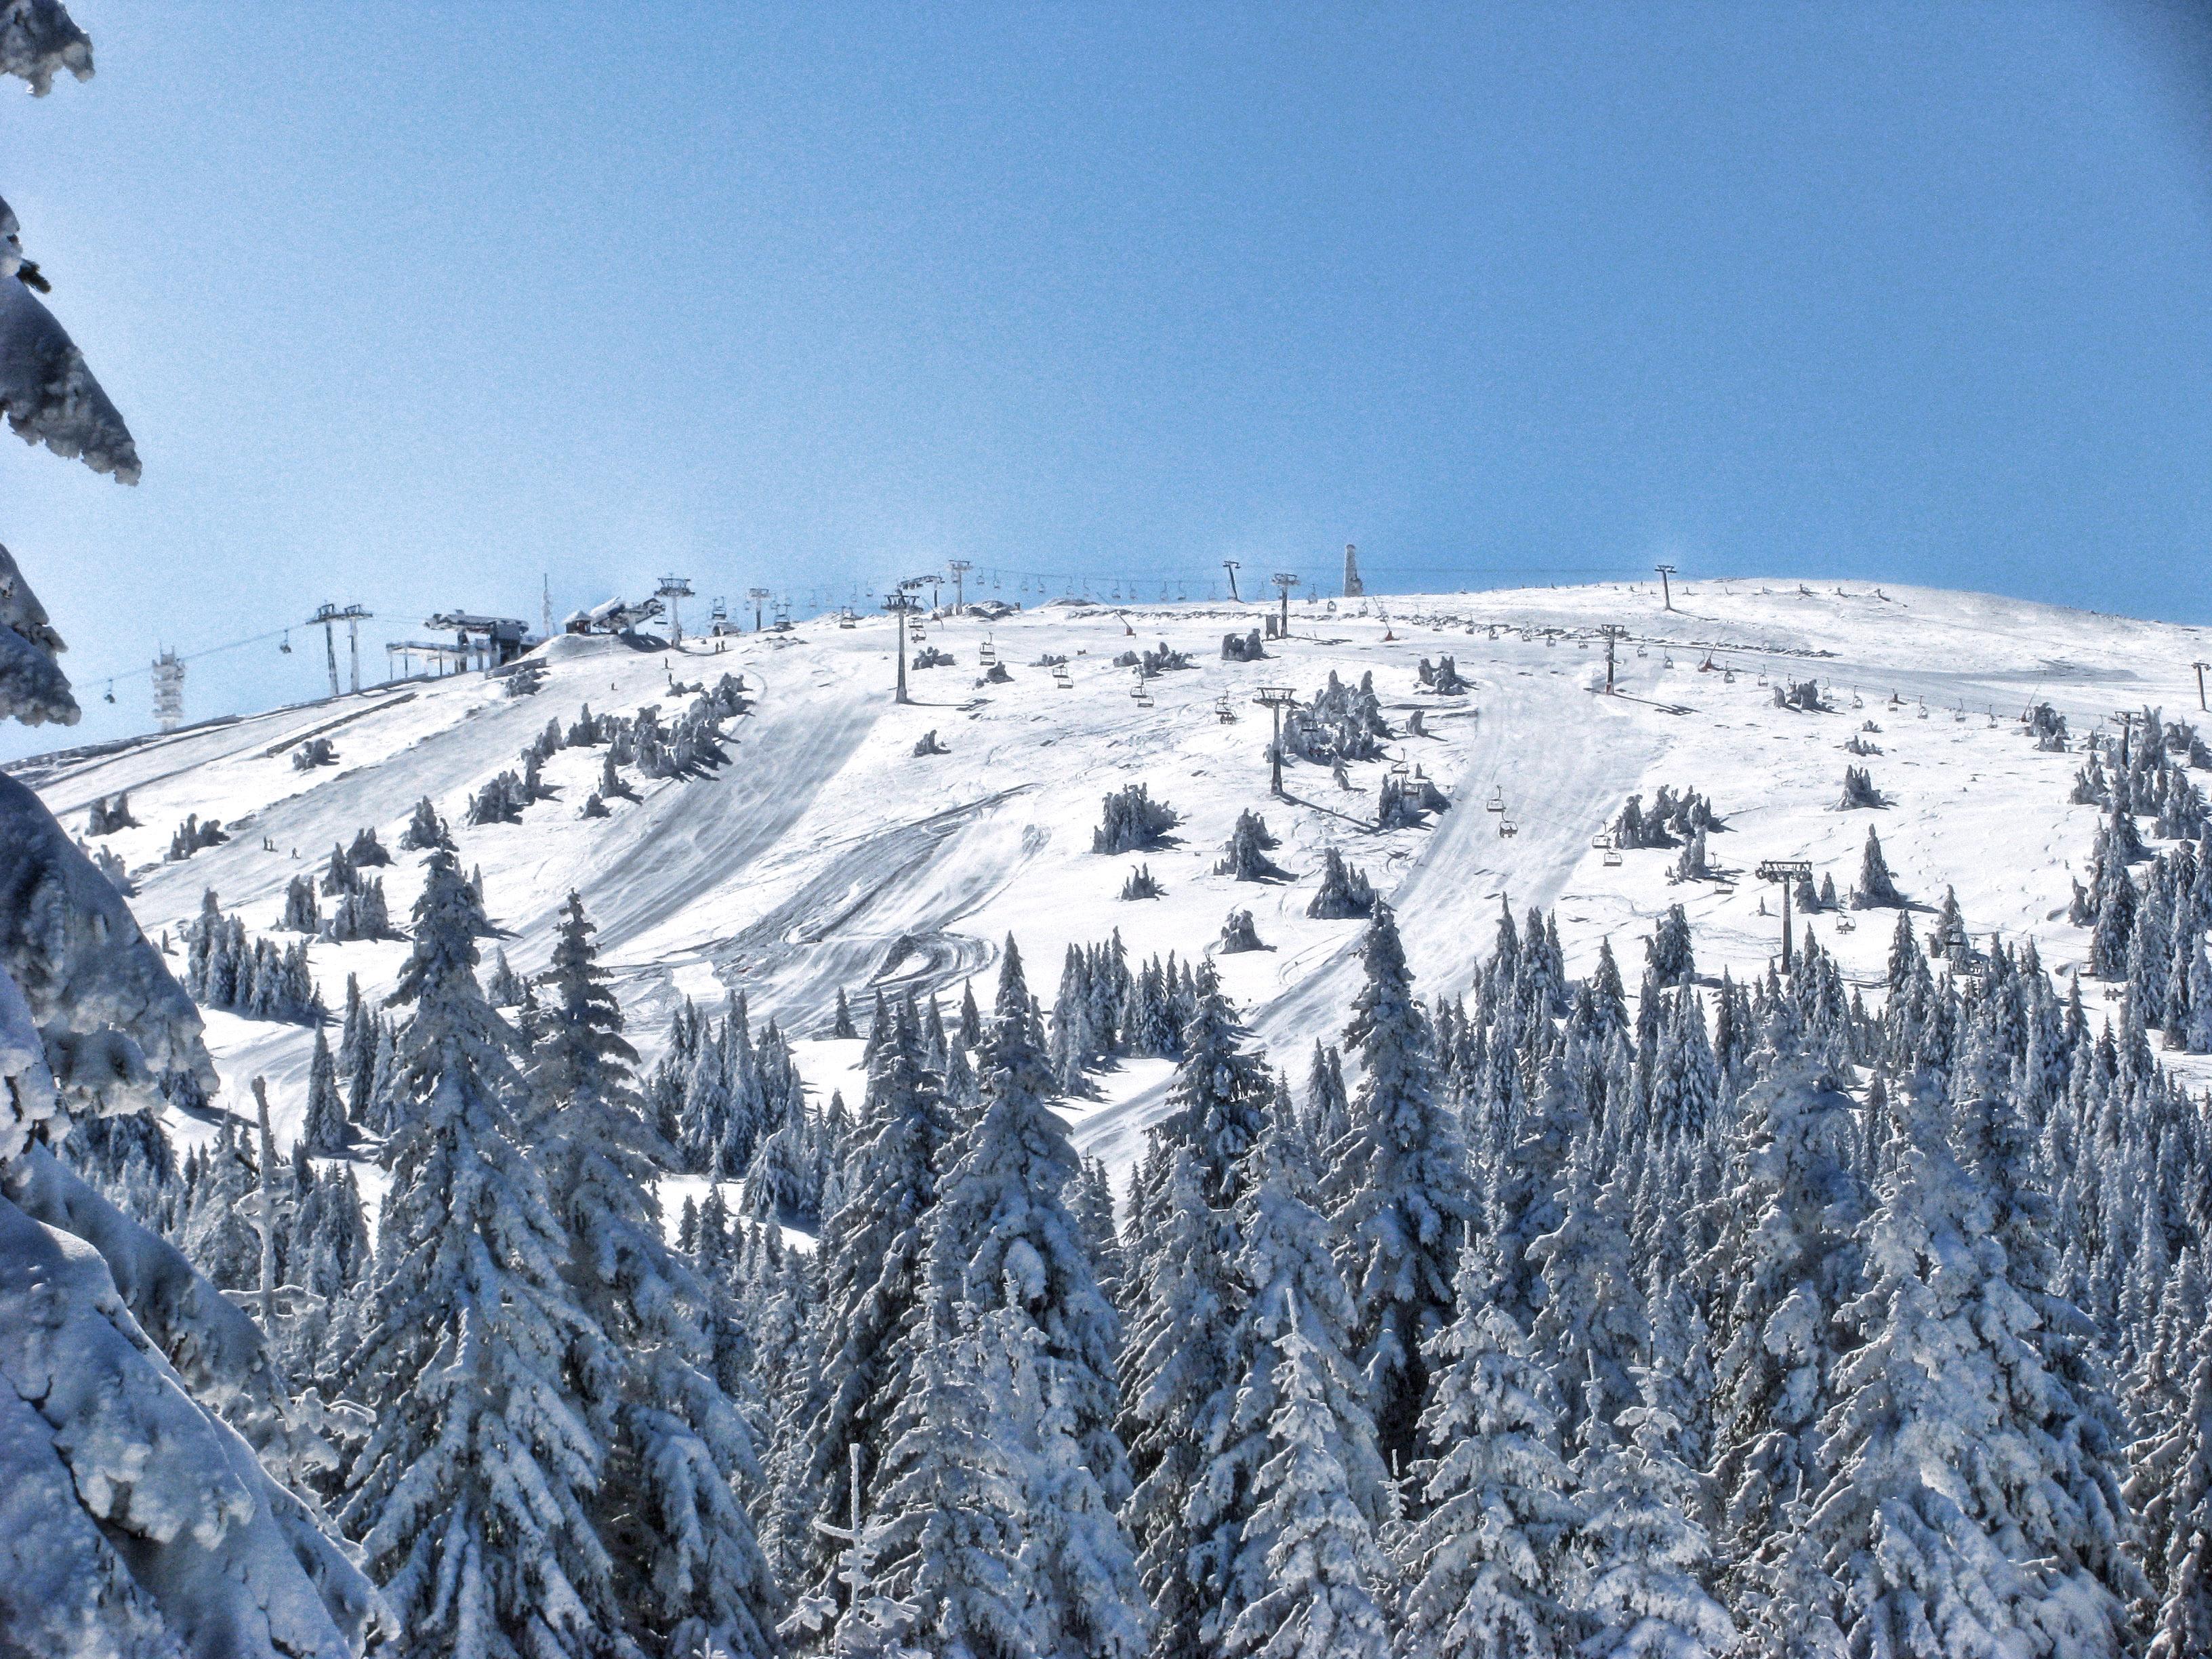 https://i1.wp.com/upload.wikimedia.org/wikipedia/commons/4/4c/Pan%C4%8Di%C4%87ev_vrh_during_winter.jpg